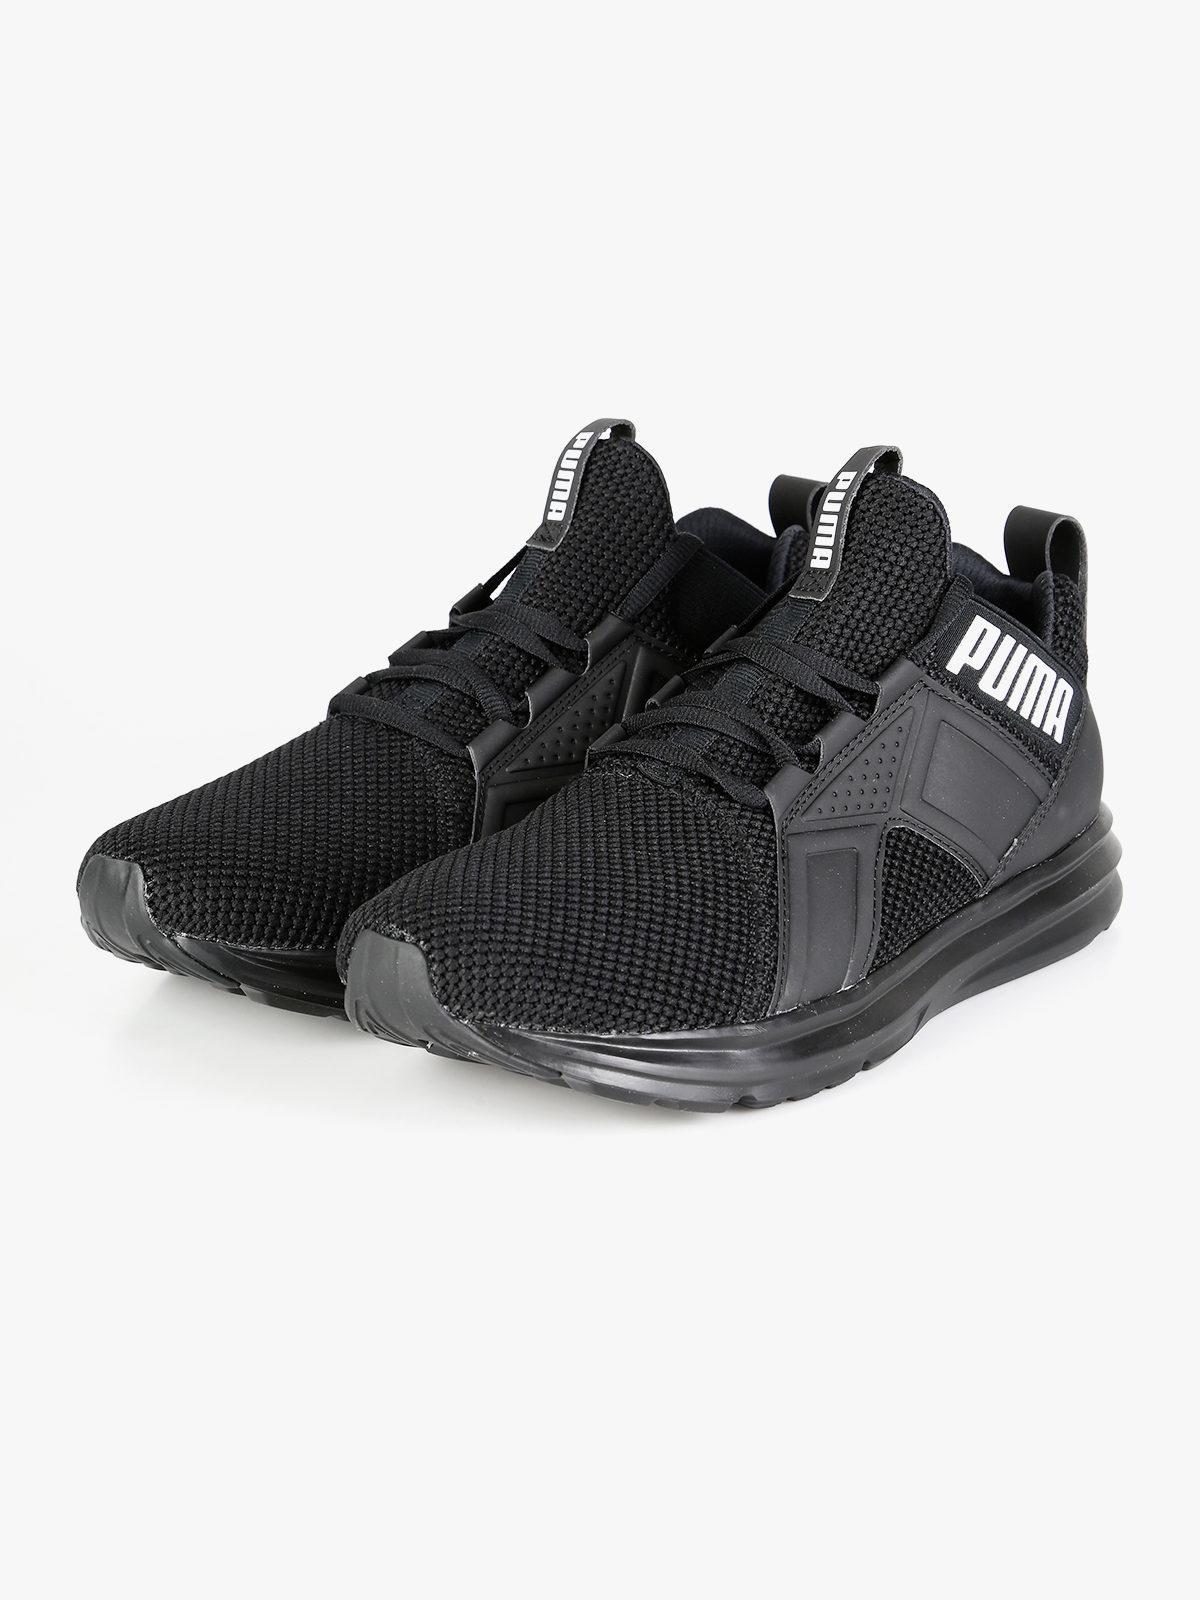 Enzo weave Sneakers sportive da uomo puma   MecShopping